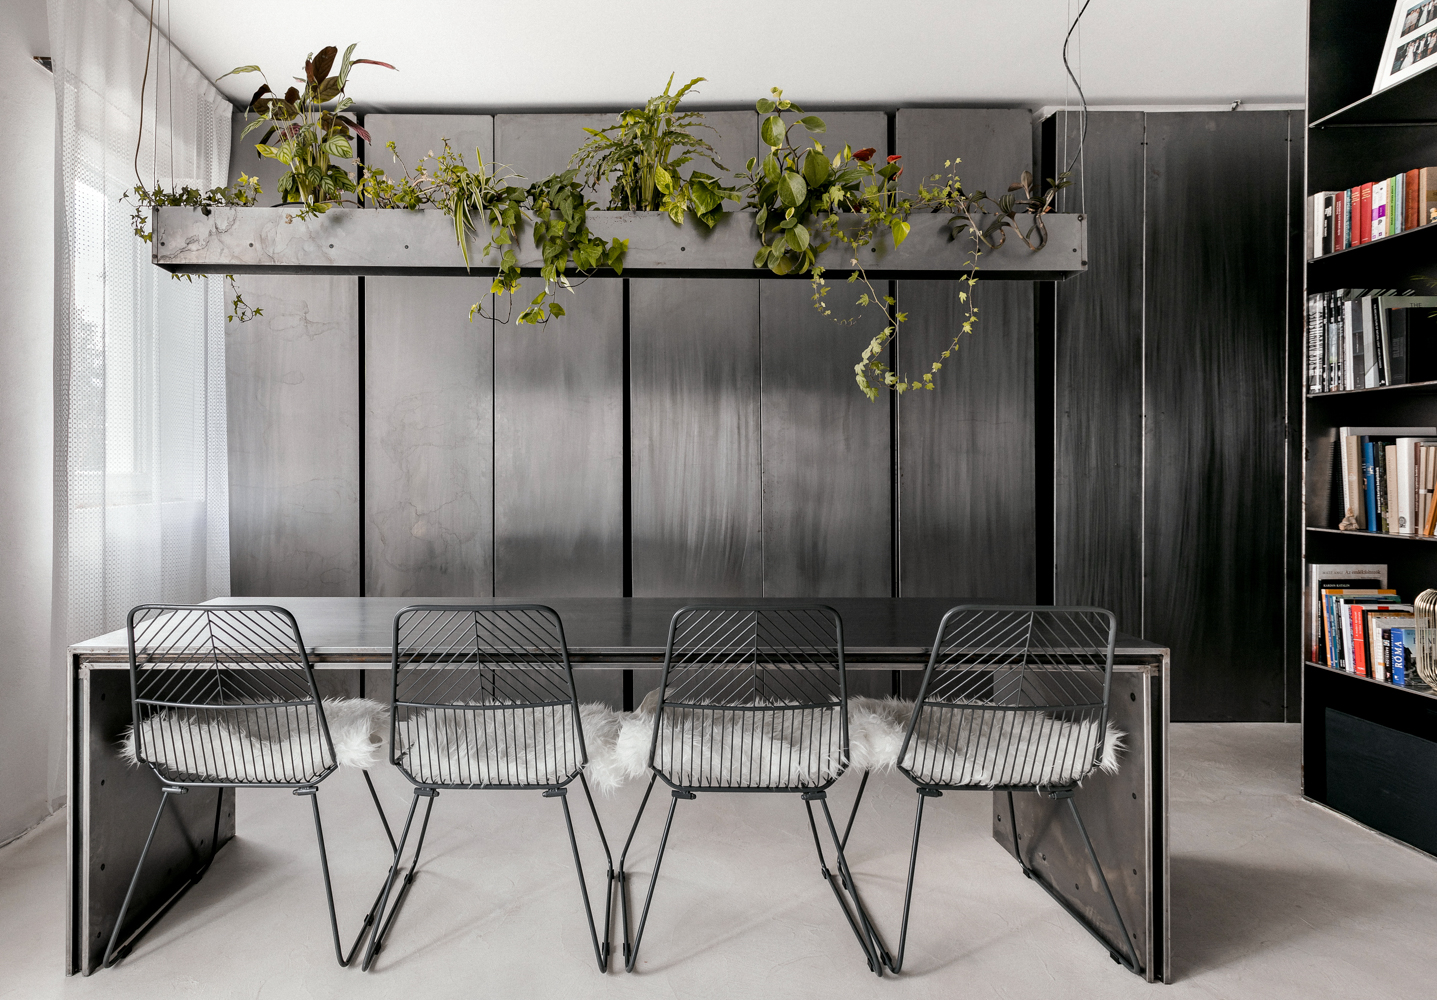 zero-room-apartment-mas-the-design-emotive-06.jpg